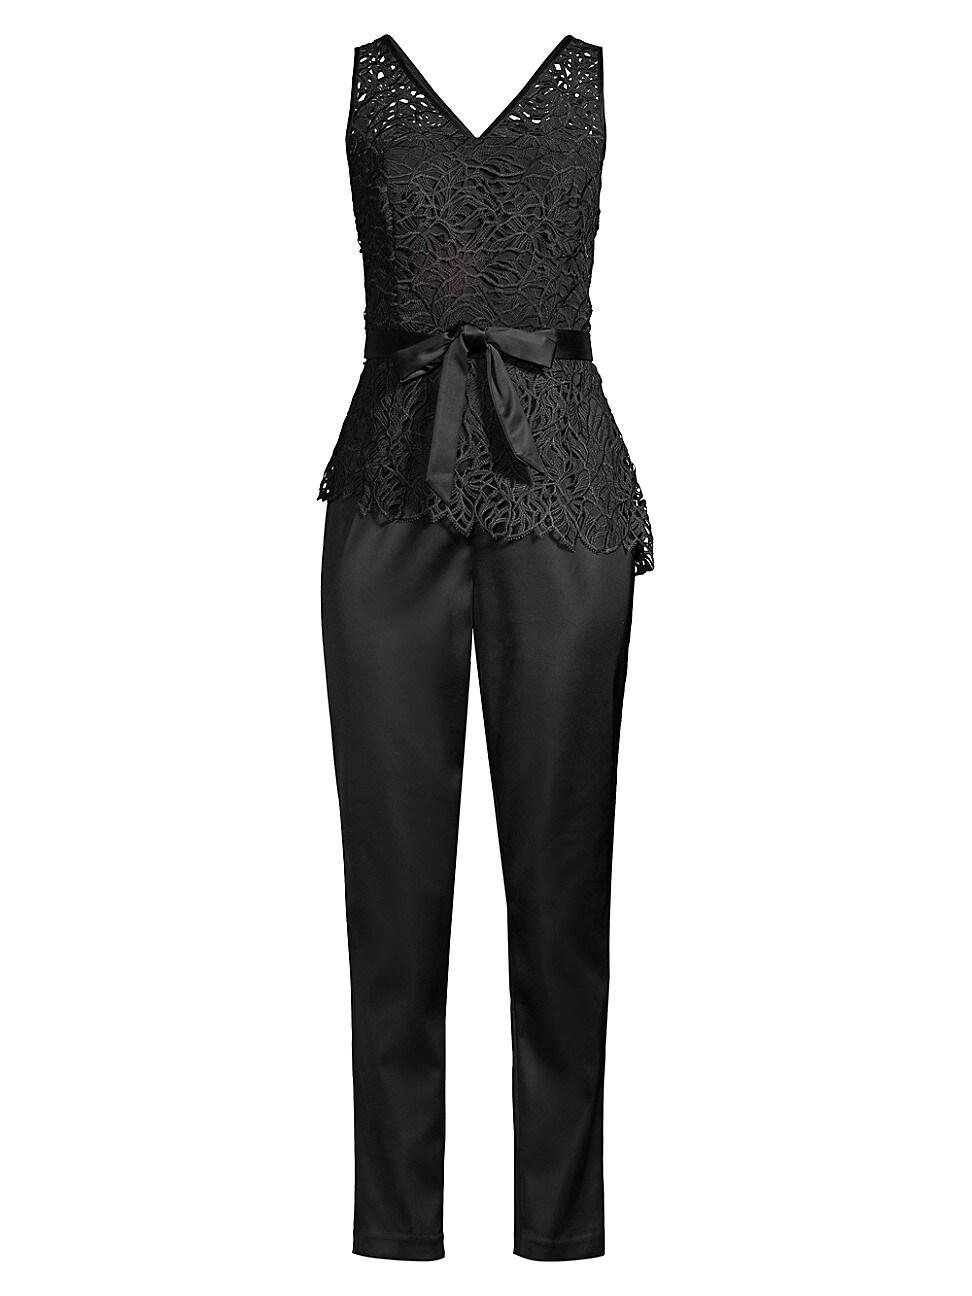 Donna Karan Women's Ivy Lace Top Jumpsuit In Black